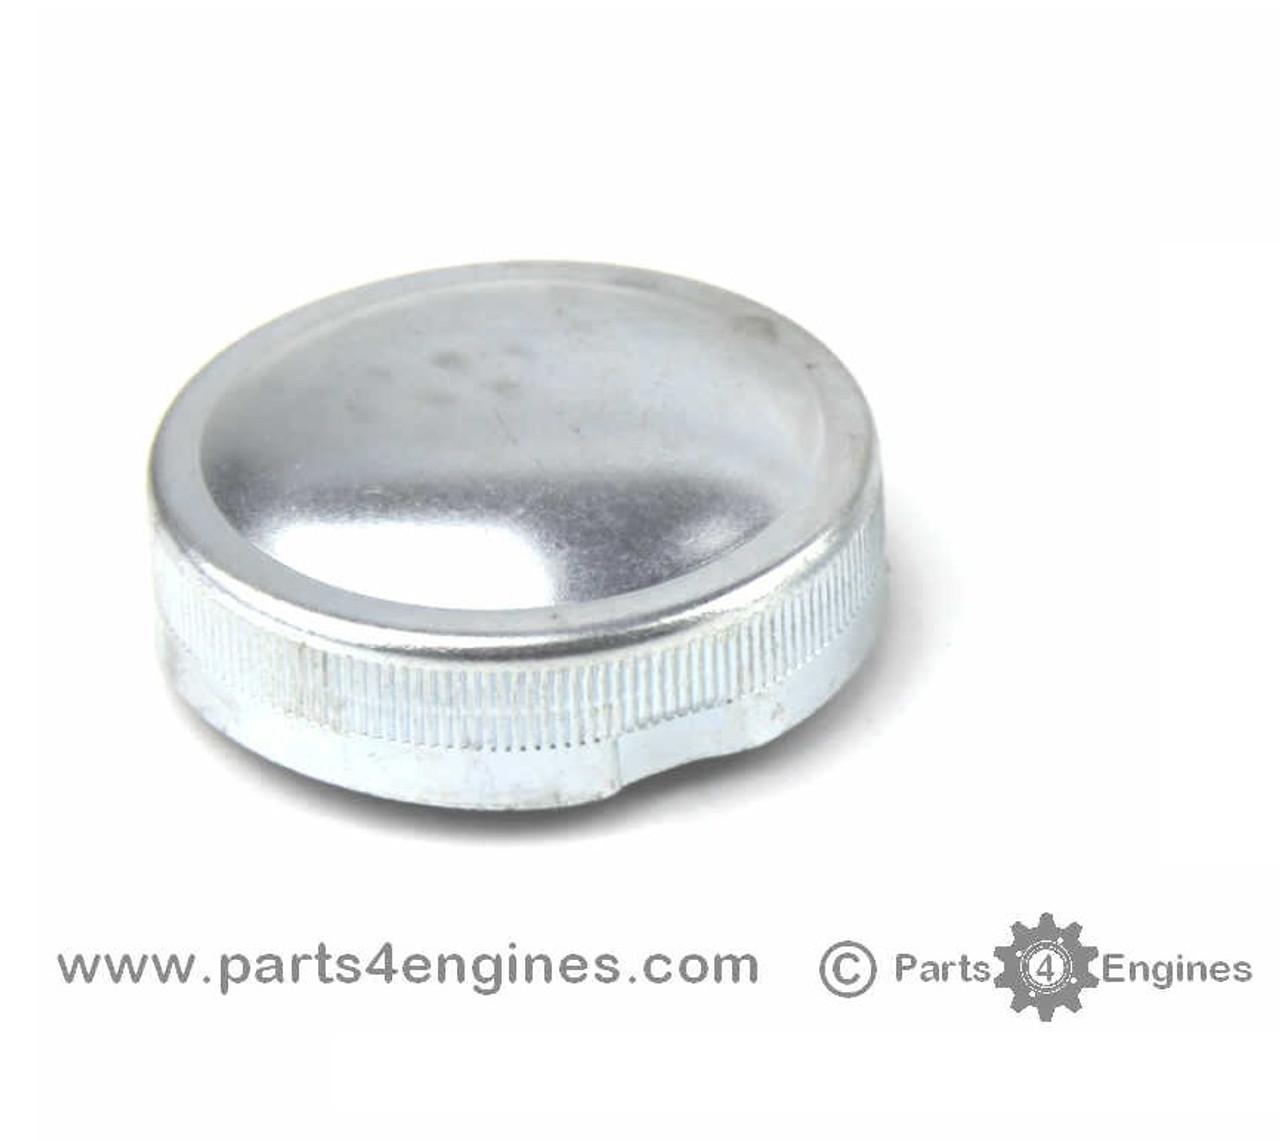 Perkins Phaser 1006 Oil Filler cap - parts4engines.com